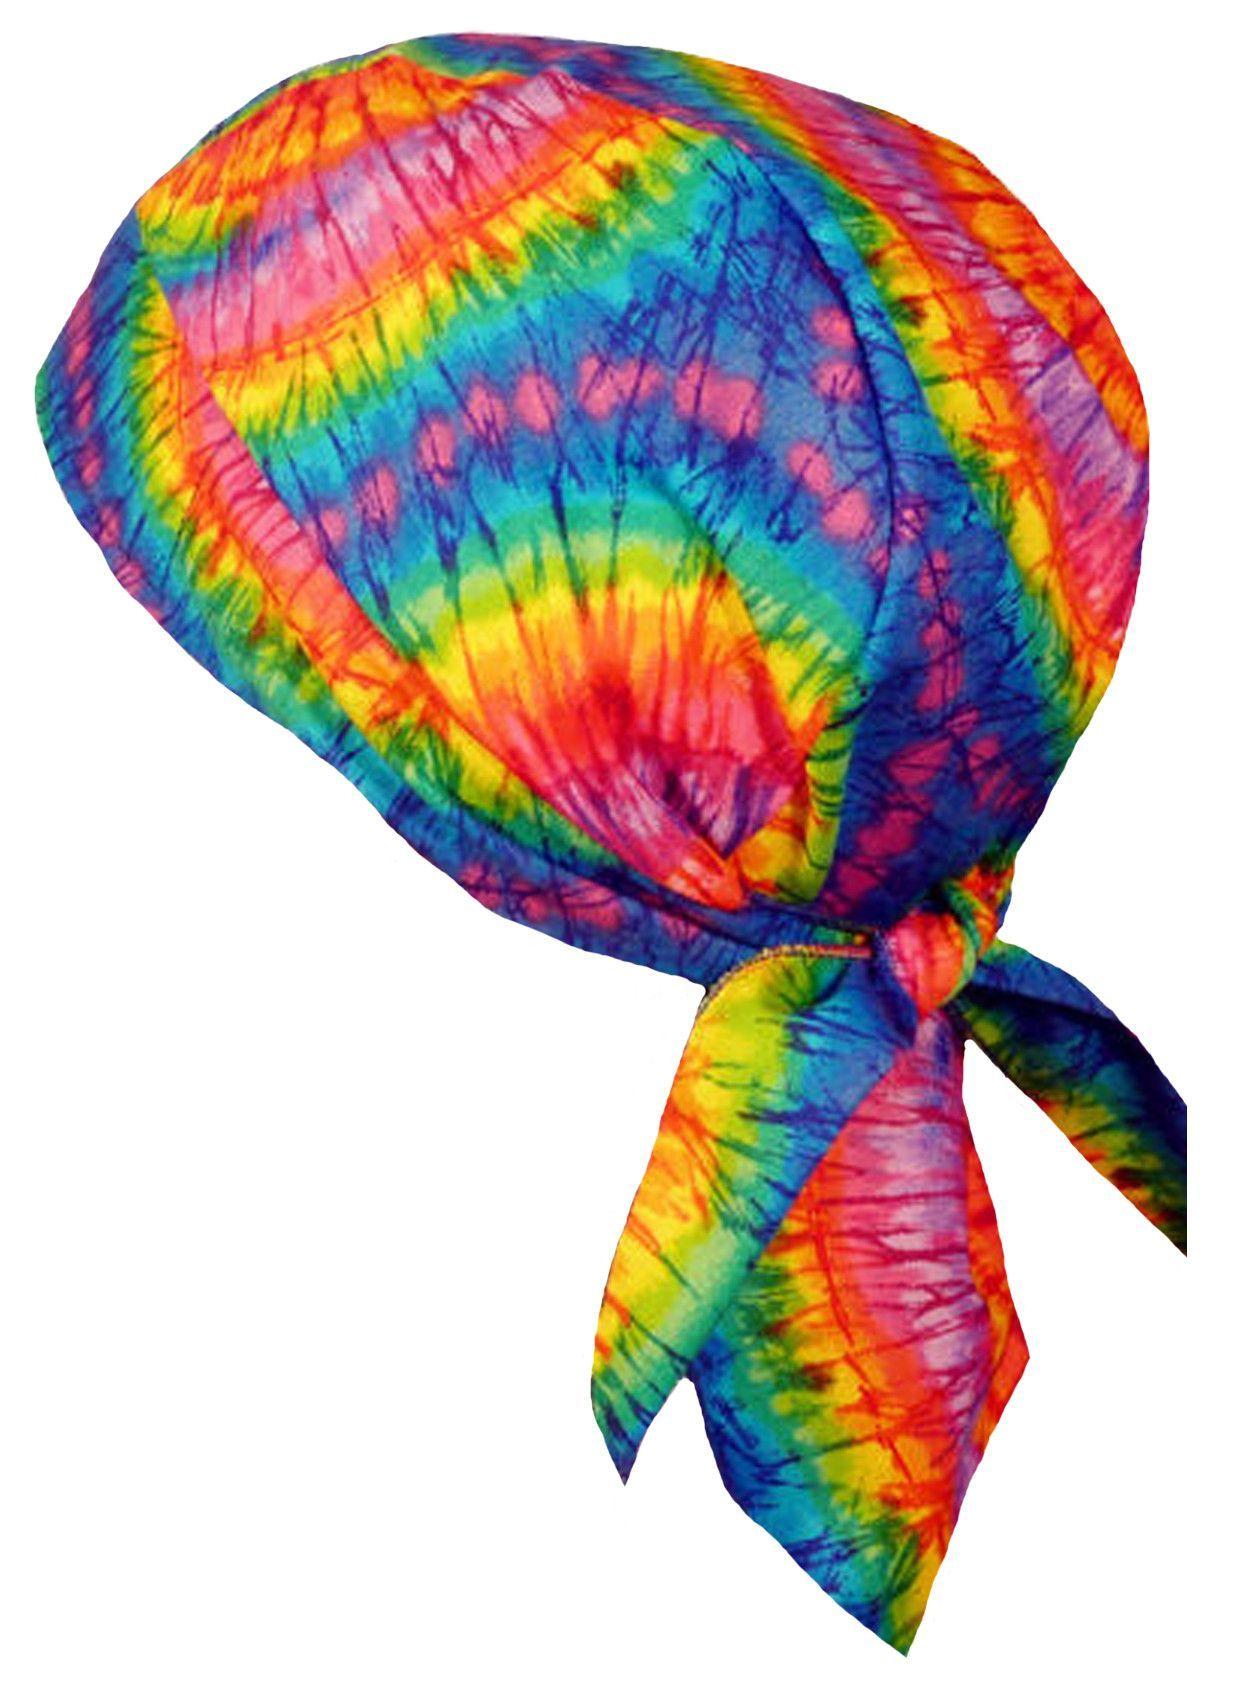 ec1ac2136f Deluxe Doo Rag Tie Dye with SWEAT BAND Rainbow Colors 1960s Head Wrap Durag  Skull Cap Cotton Sporty Motorcycle Do Hat